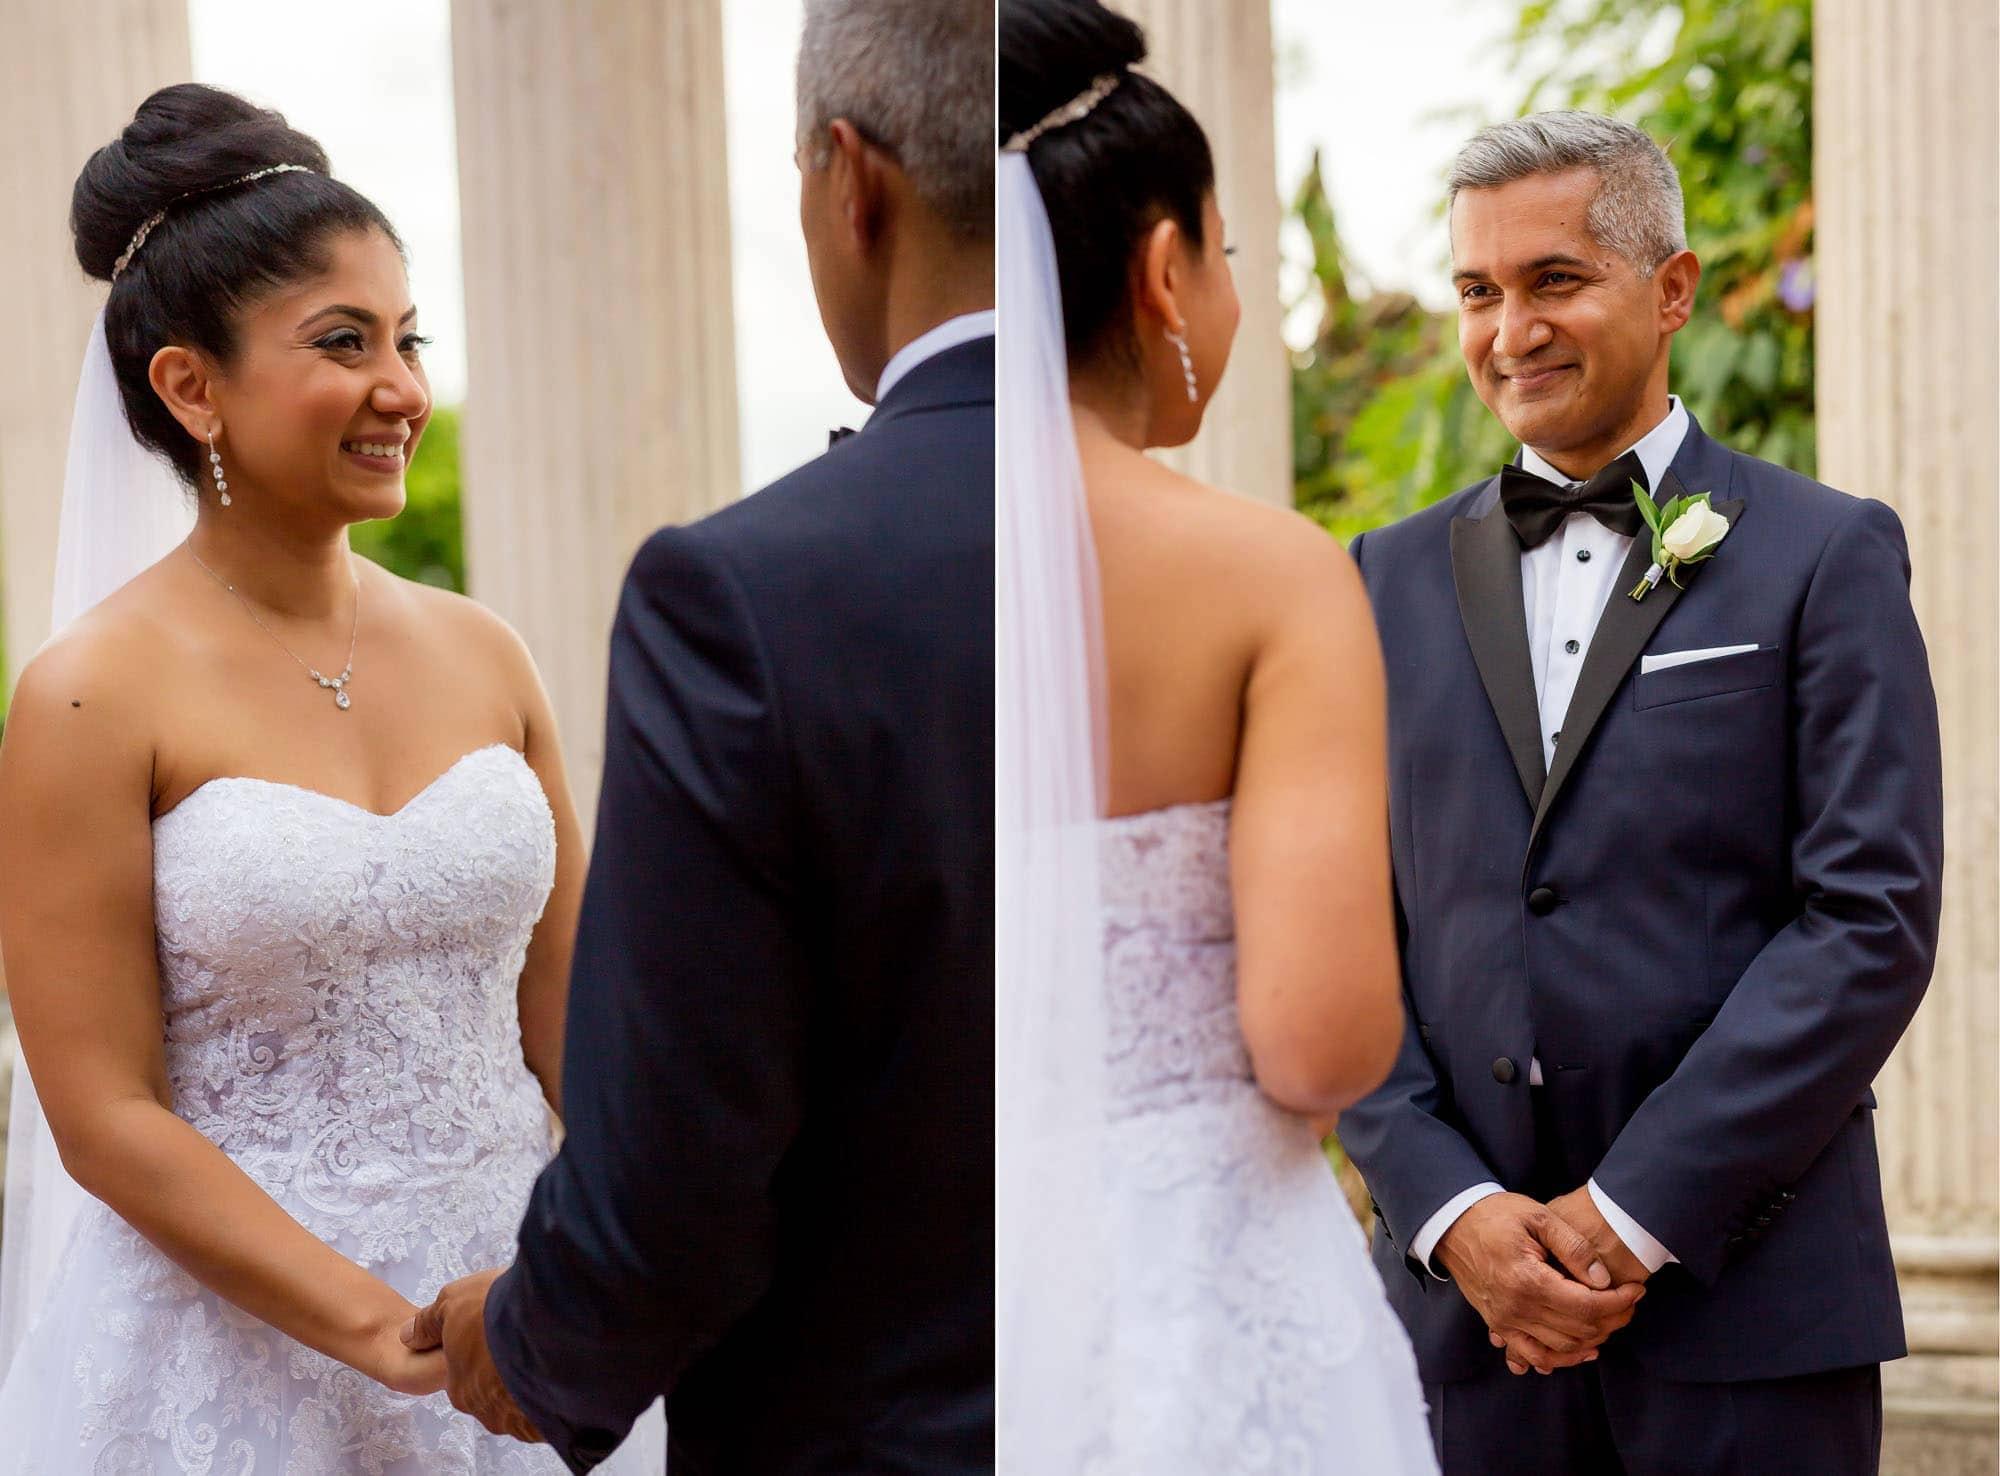 The symbolic wedding ceremony